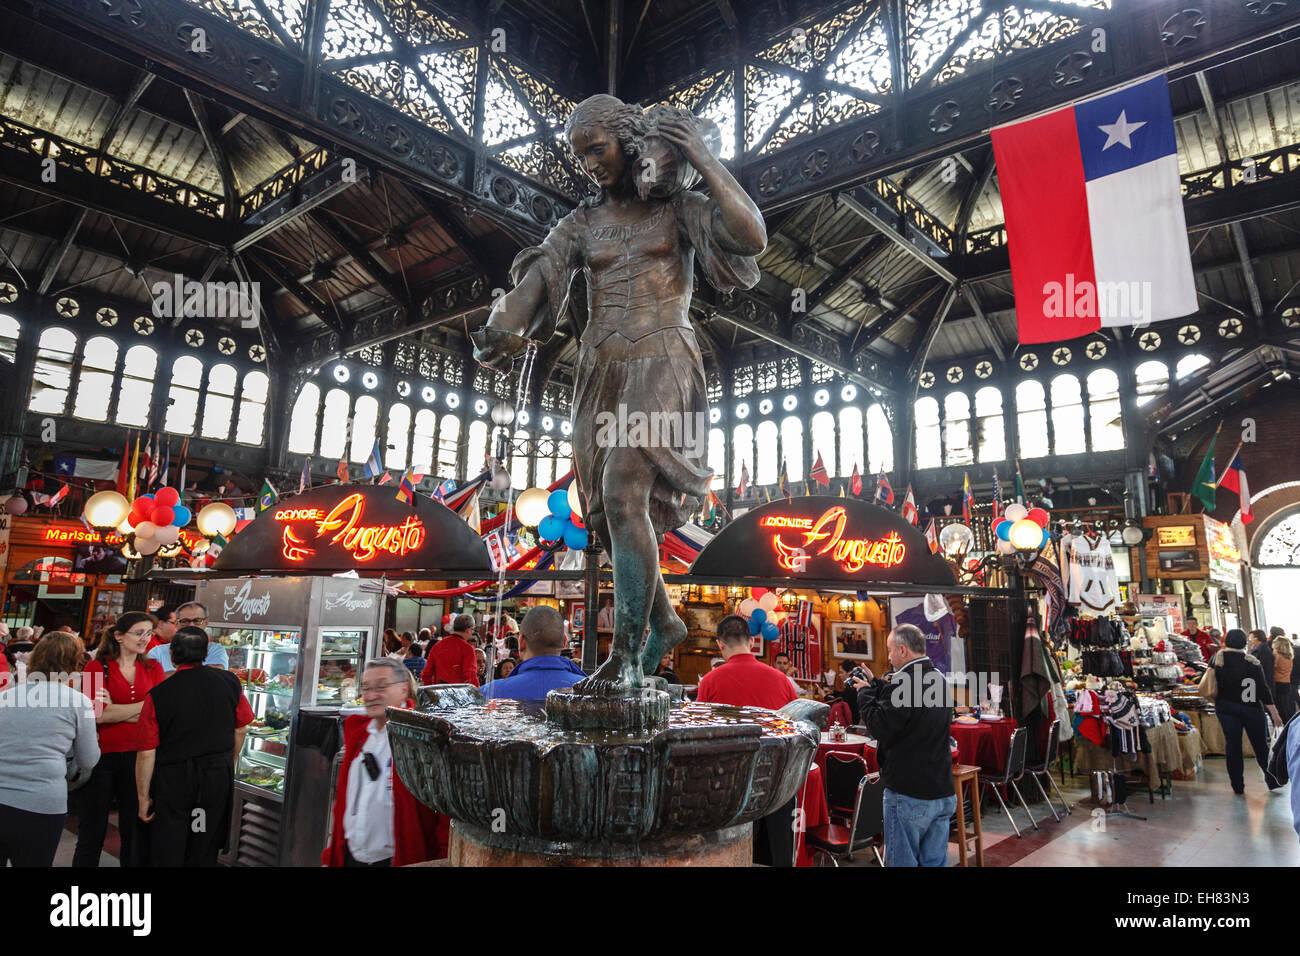 Mercado Central, Santiago, Chile, South America - Stock Image